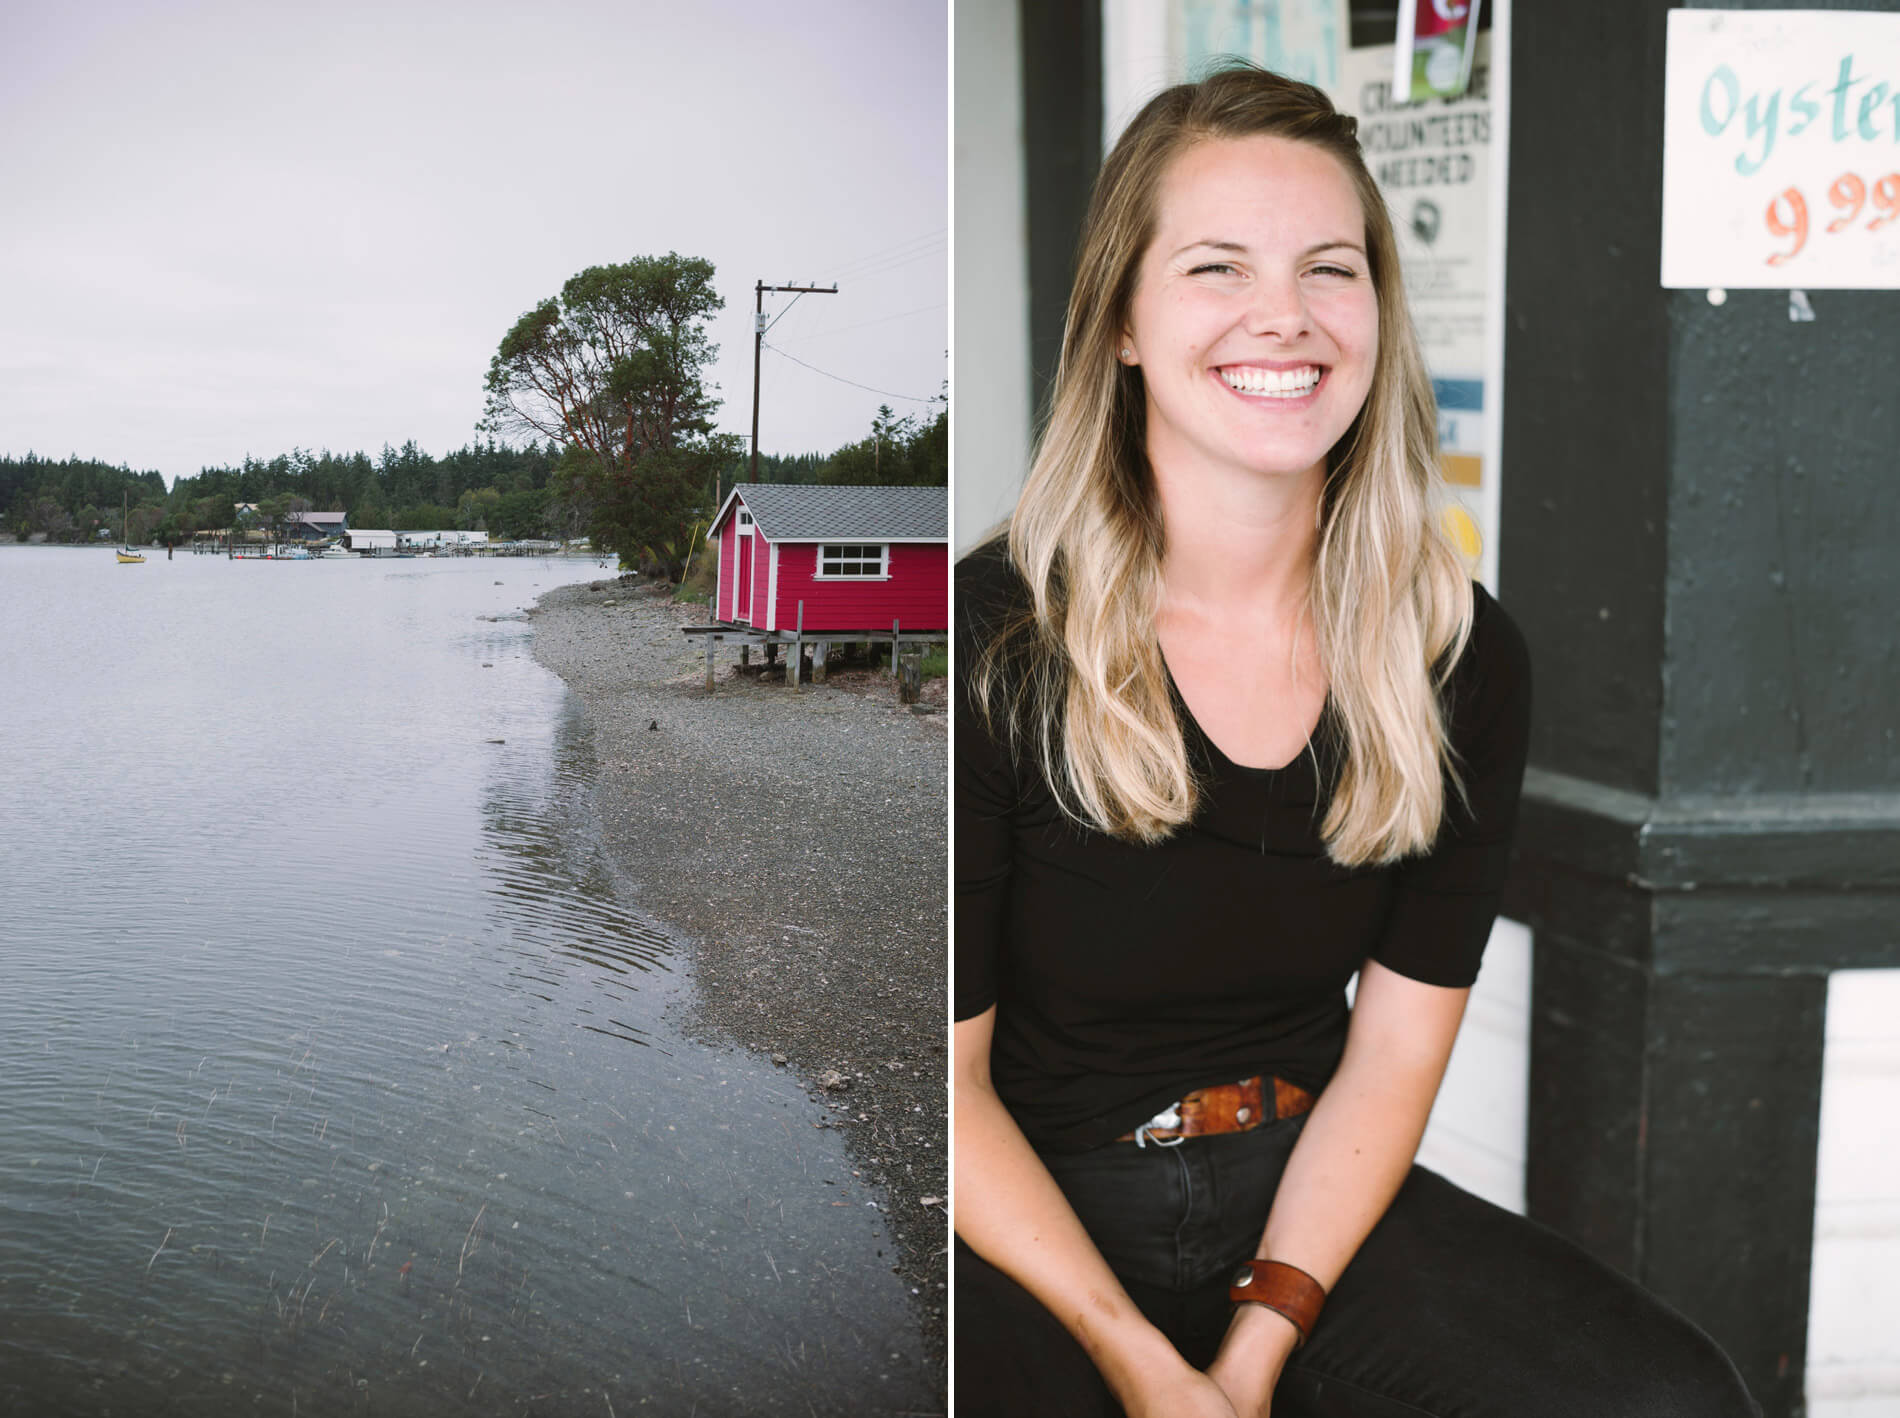 seattle-photographer-kyle-larson-island-girl-seafood